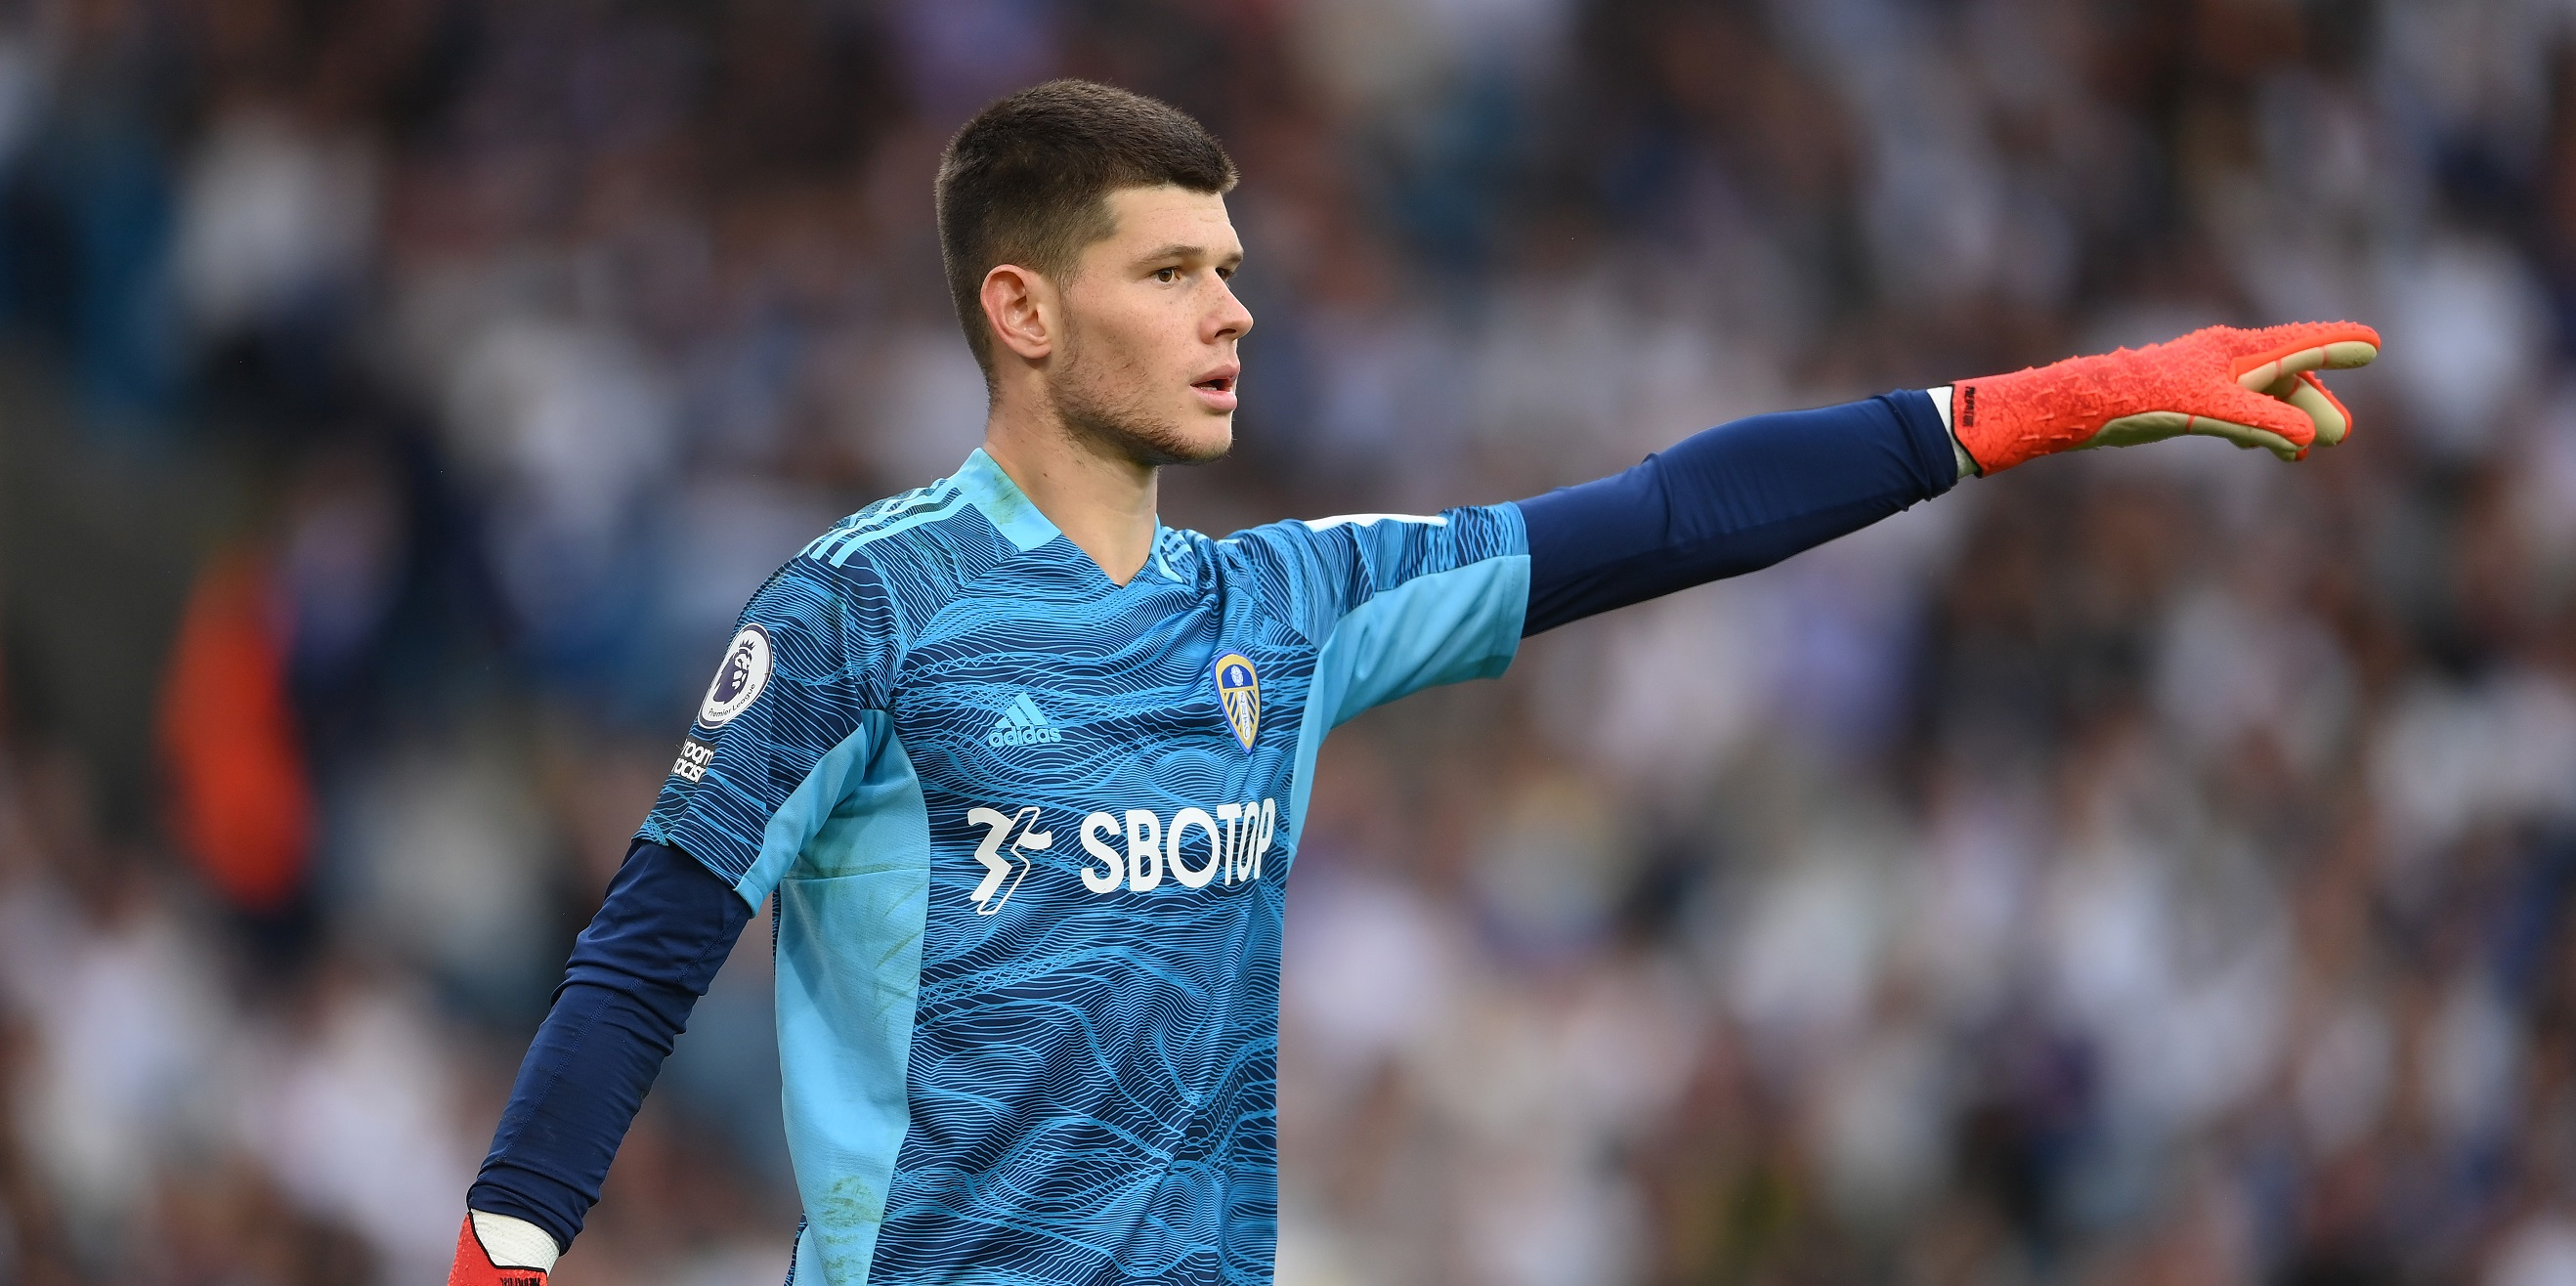 Liverpool express interest in surprise third Leeds United star worth £18m – Football Insider